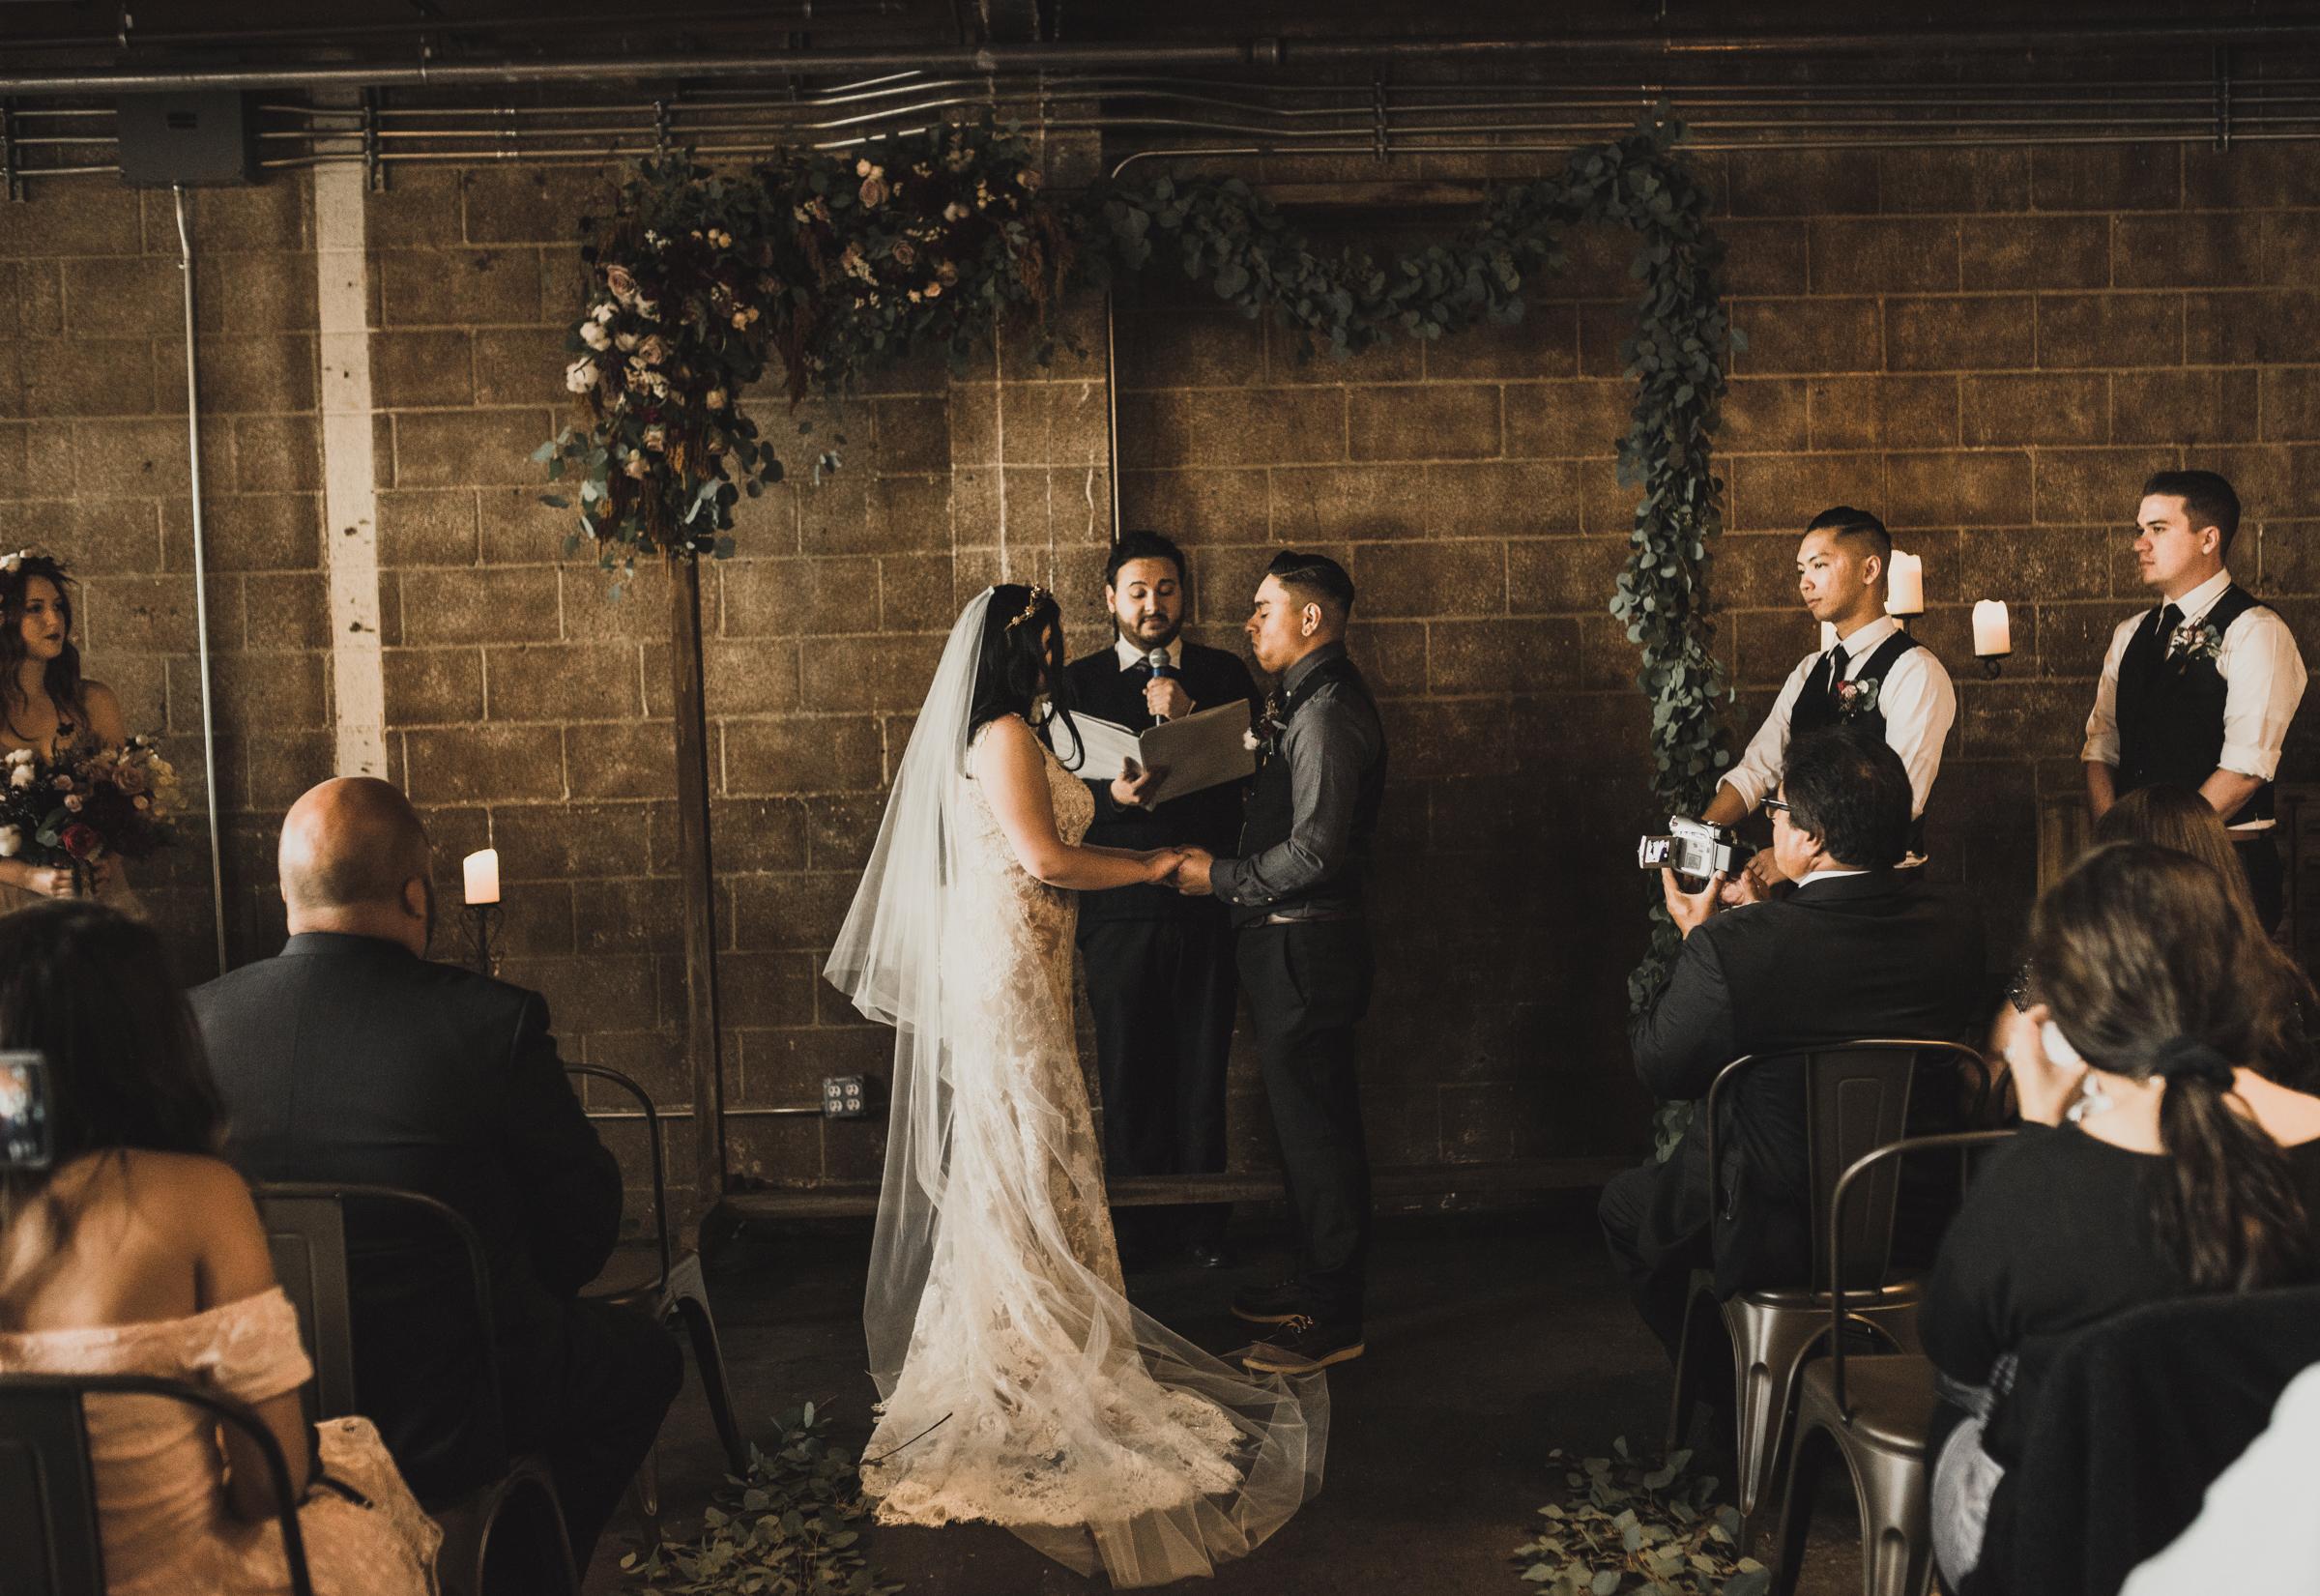 ©Isaiah + Taylor Photography - Smoky Hollow Studios Wedding, El Segundo, Los Angeles Wedding Photographer-49.jpg